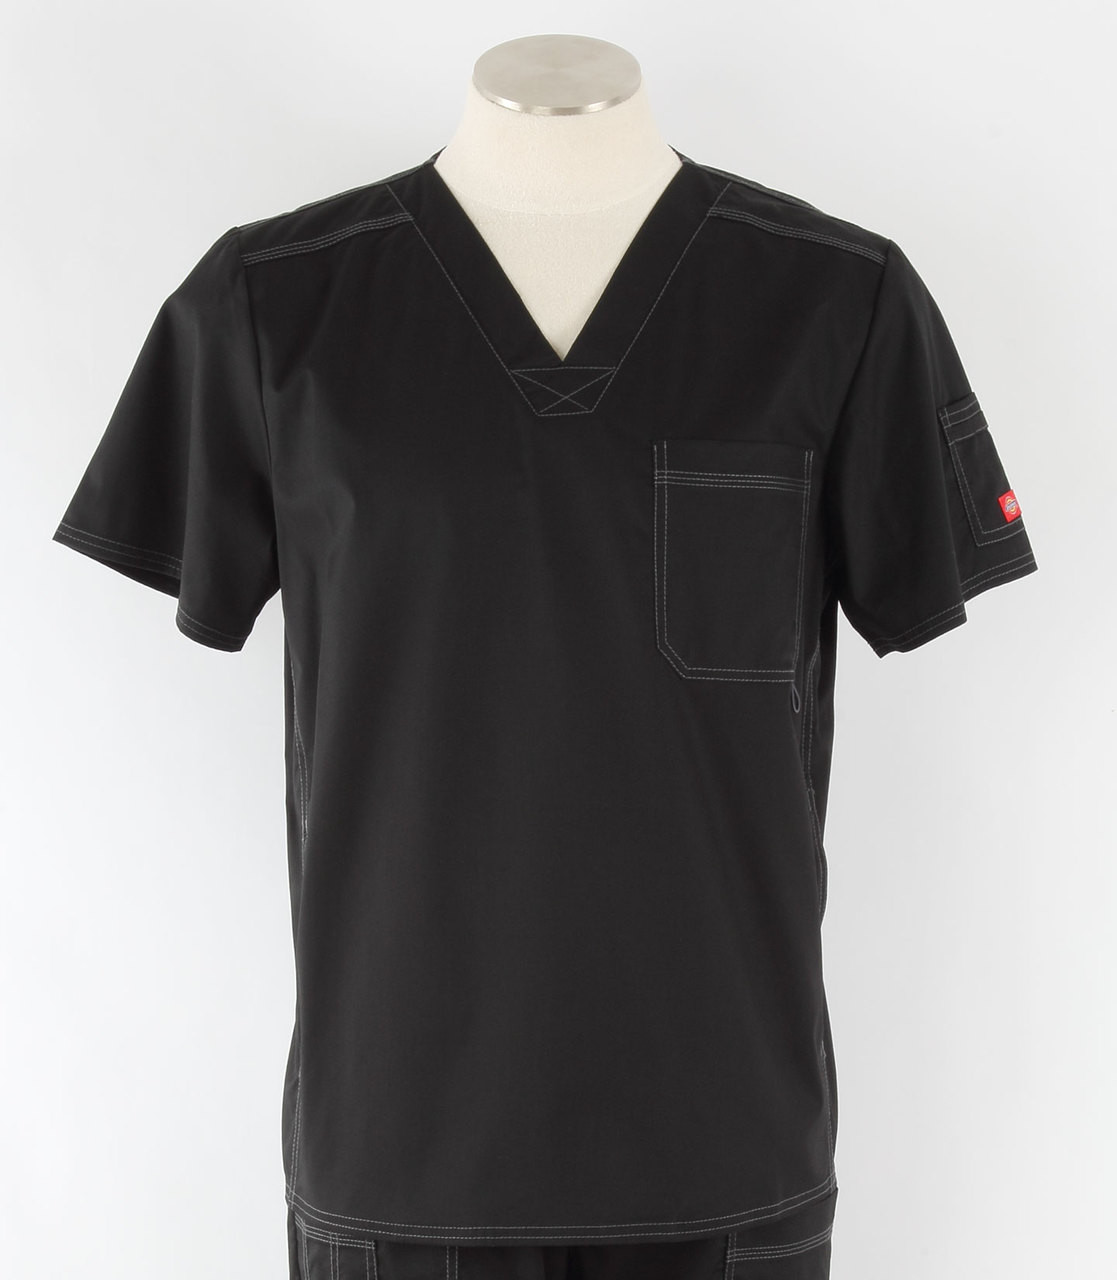 1a69a81ef93 Dickies Gen Flex Mens V-Neck Scrub Top Black - Scrub Med